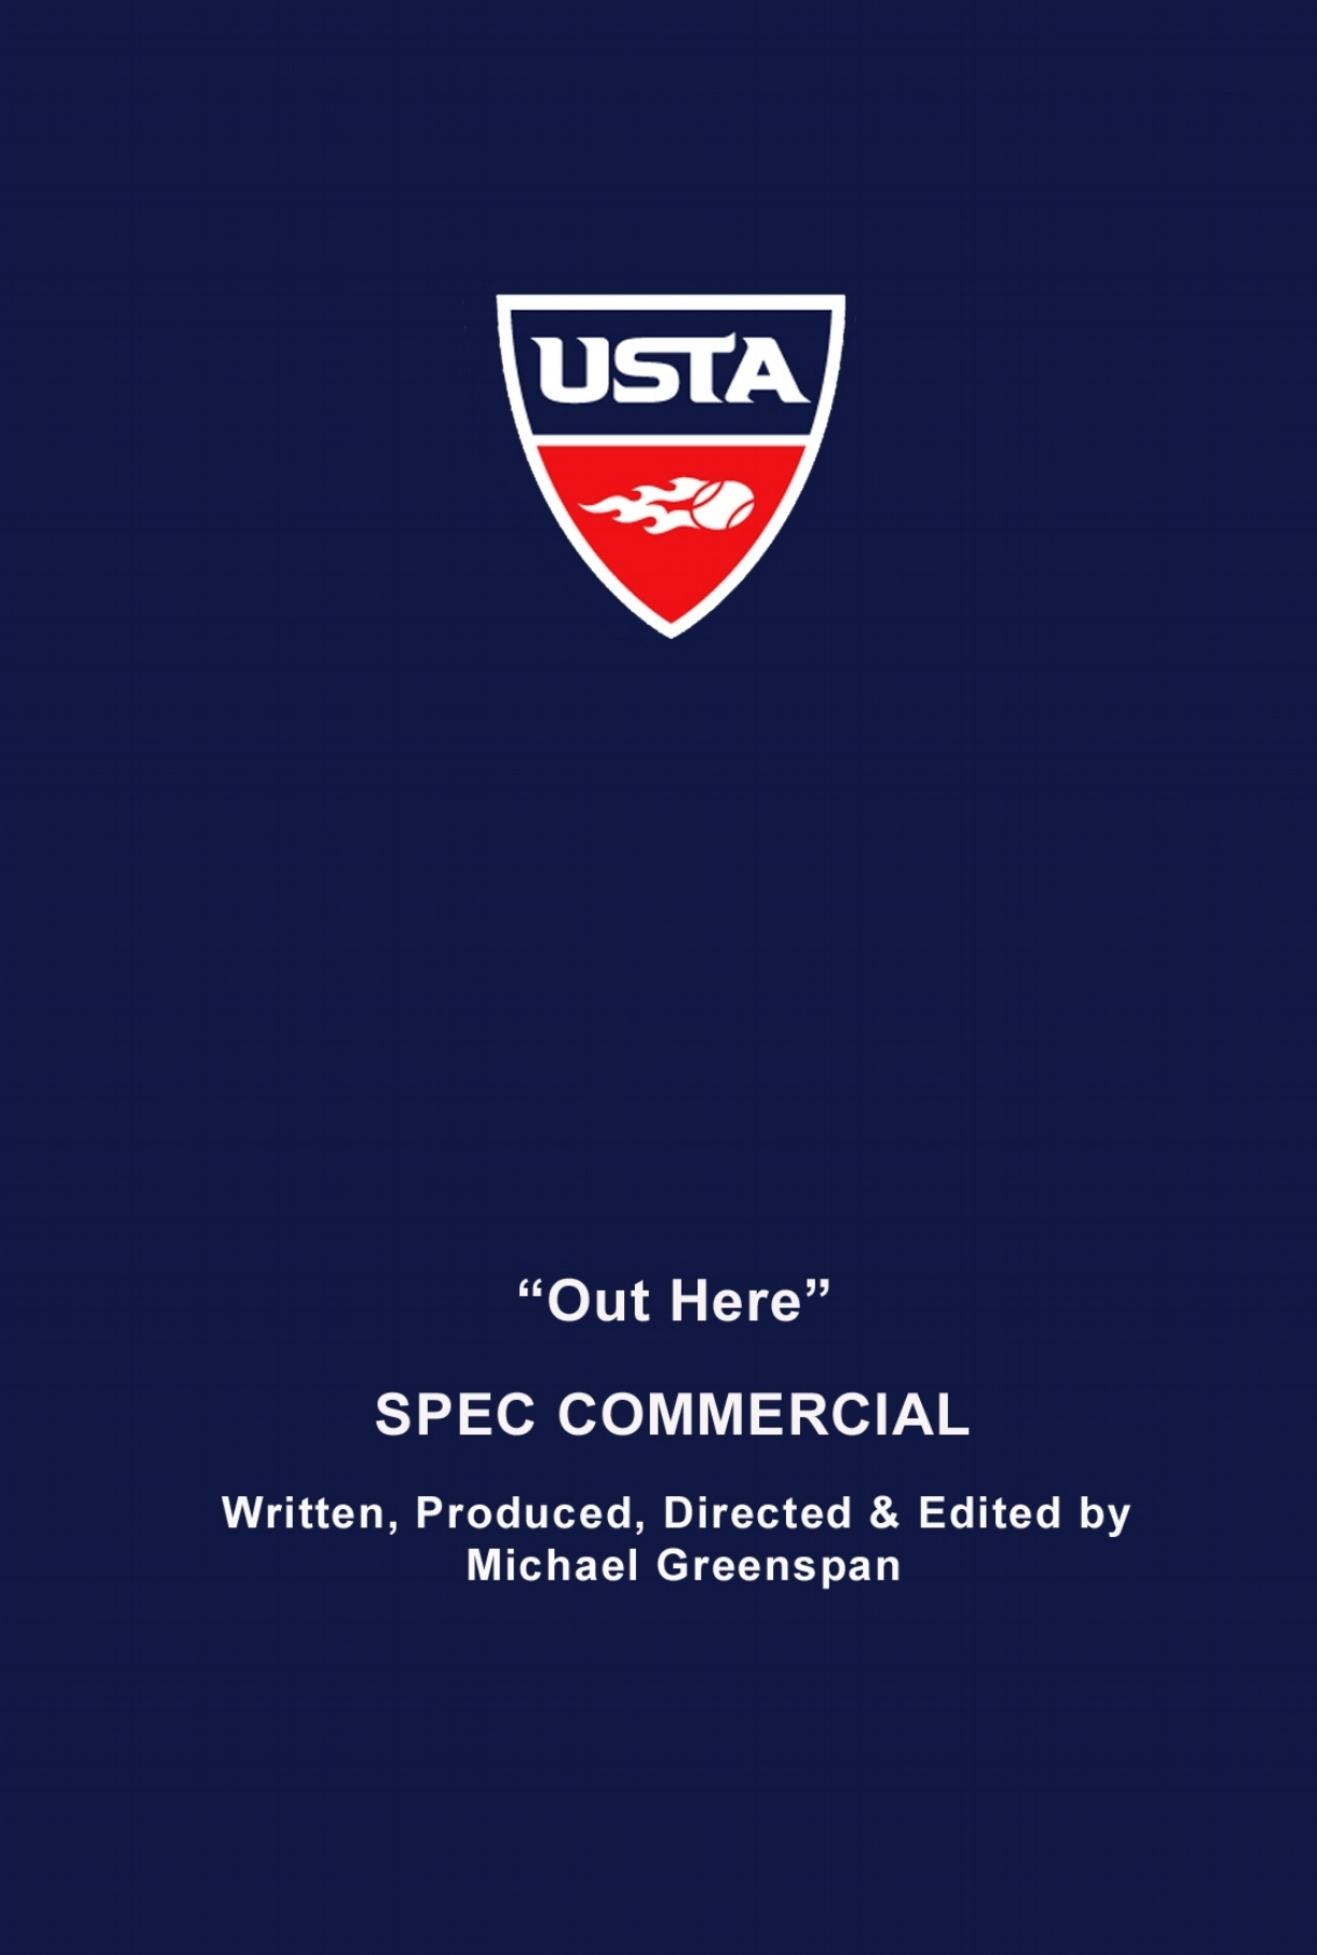 USTA Poster Art.jpg